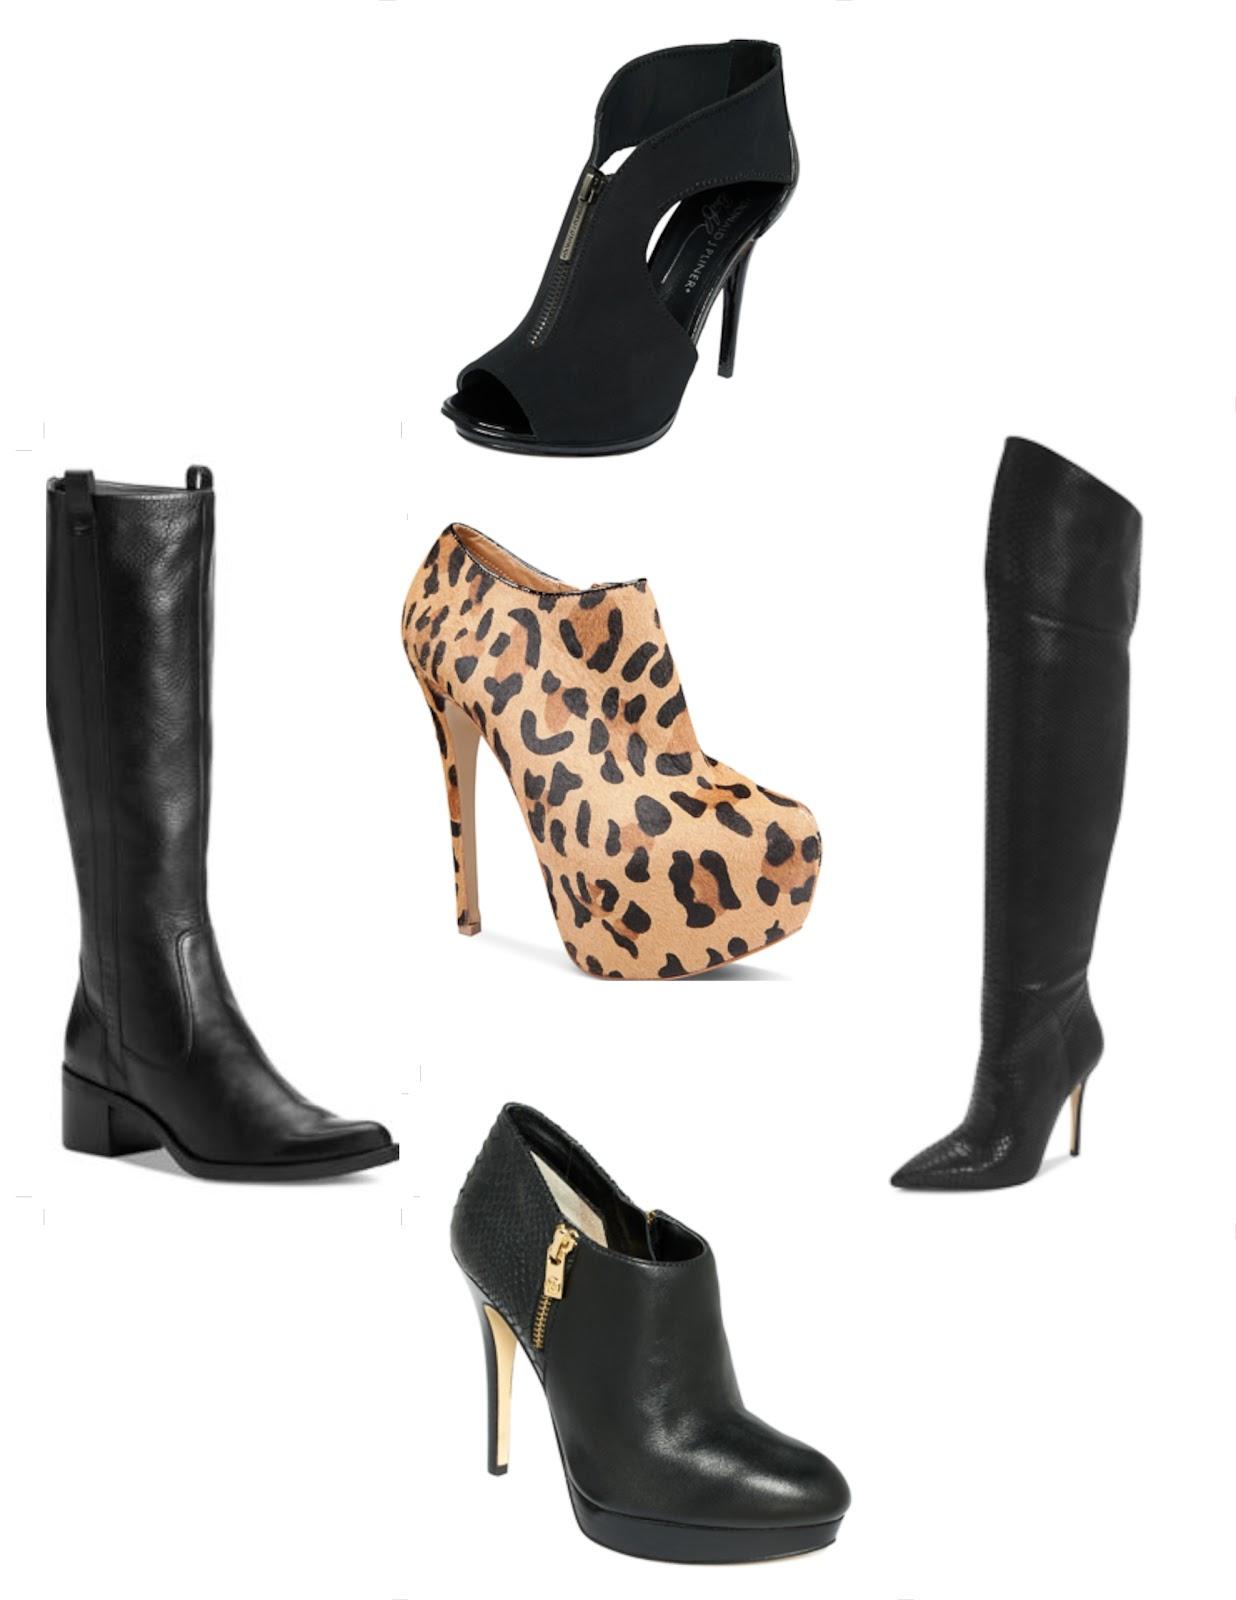 http://2.bp.blogspot.com/-QRKFFBcxf_4/UKUbcjkRvcI/AAAAAAAAHLI/5xyxLQbbvew/s1600/macys+fall+shoes+boots.jpg